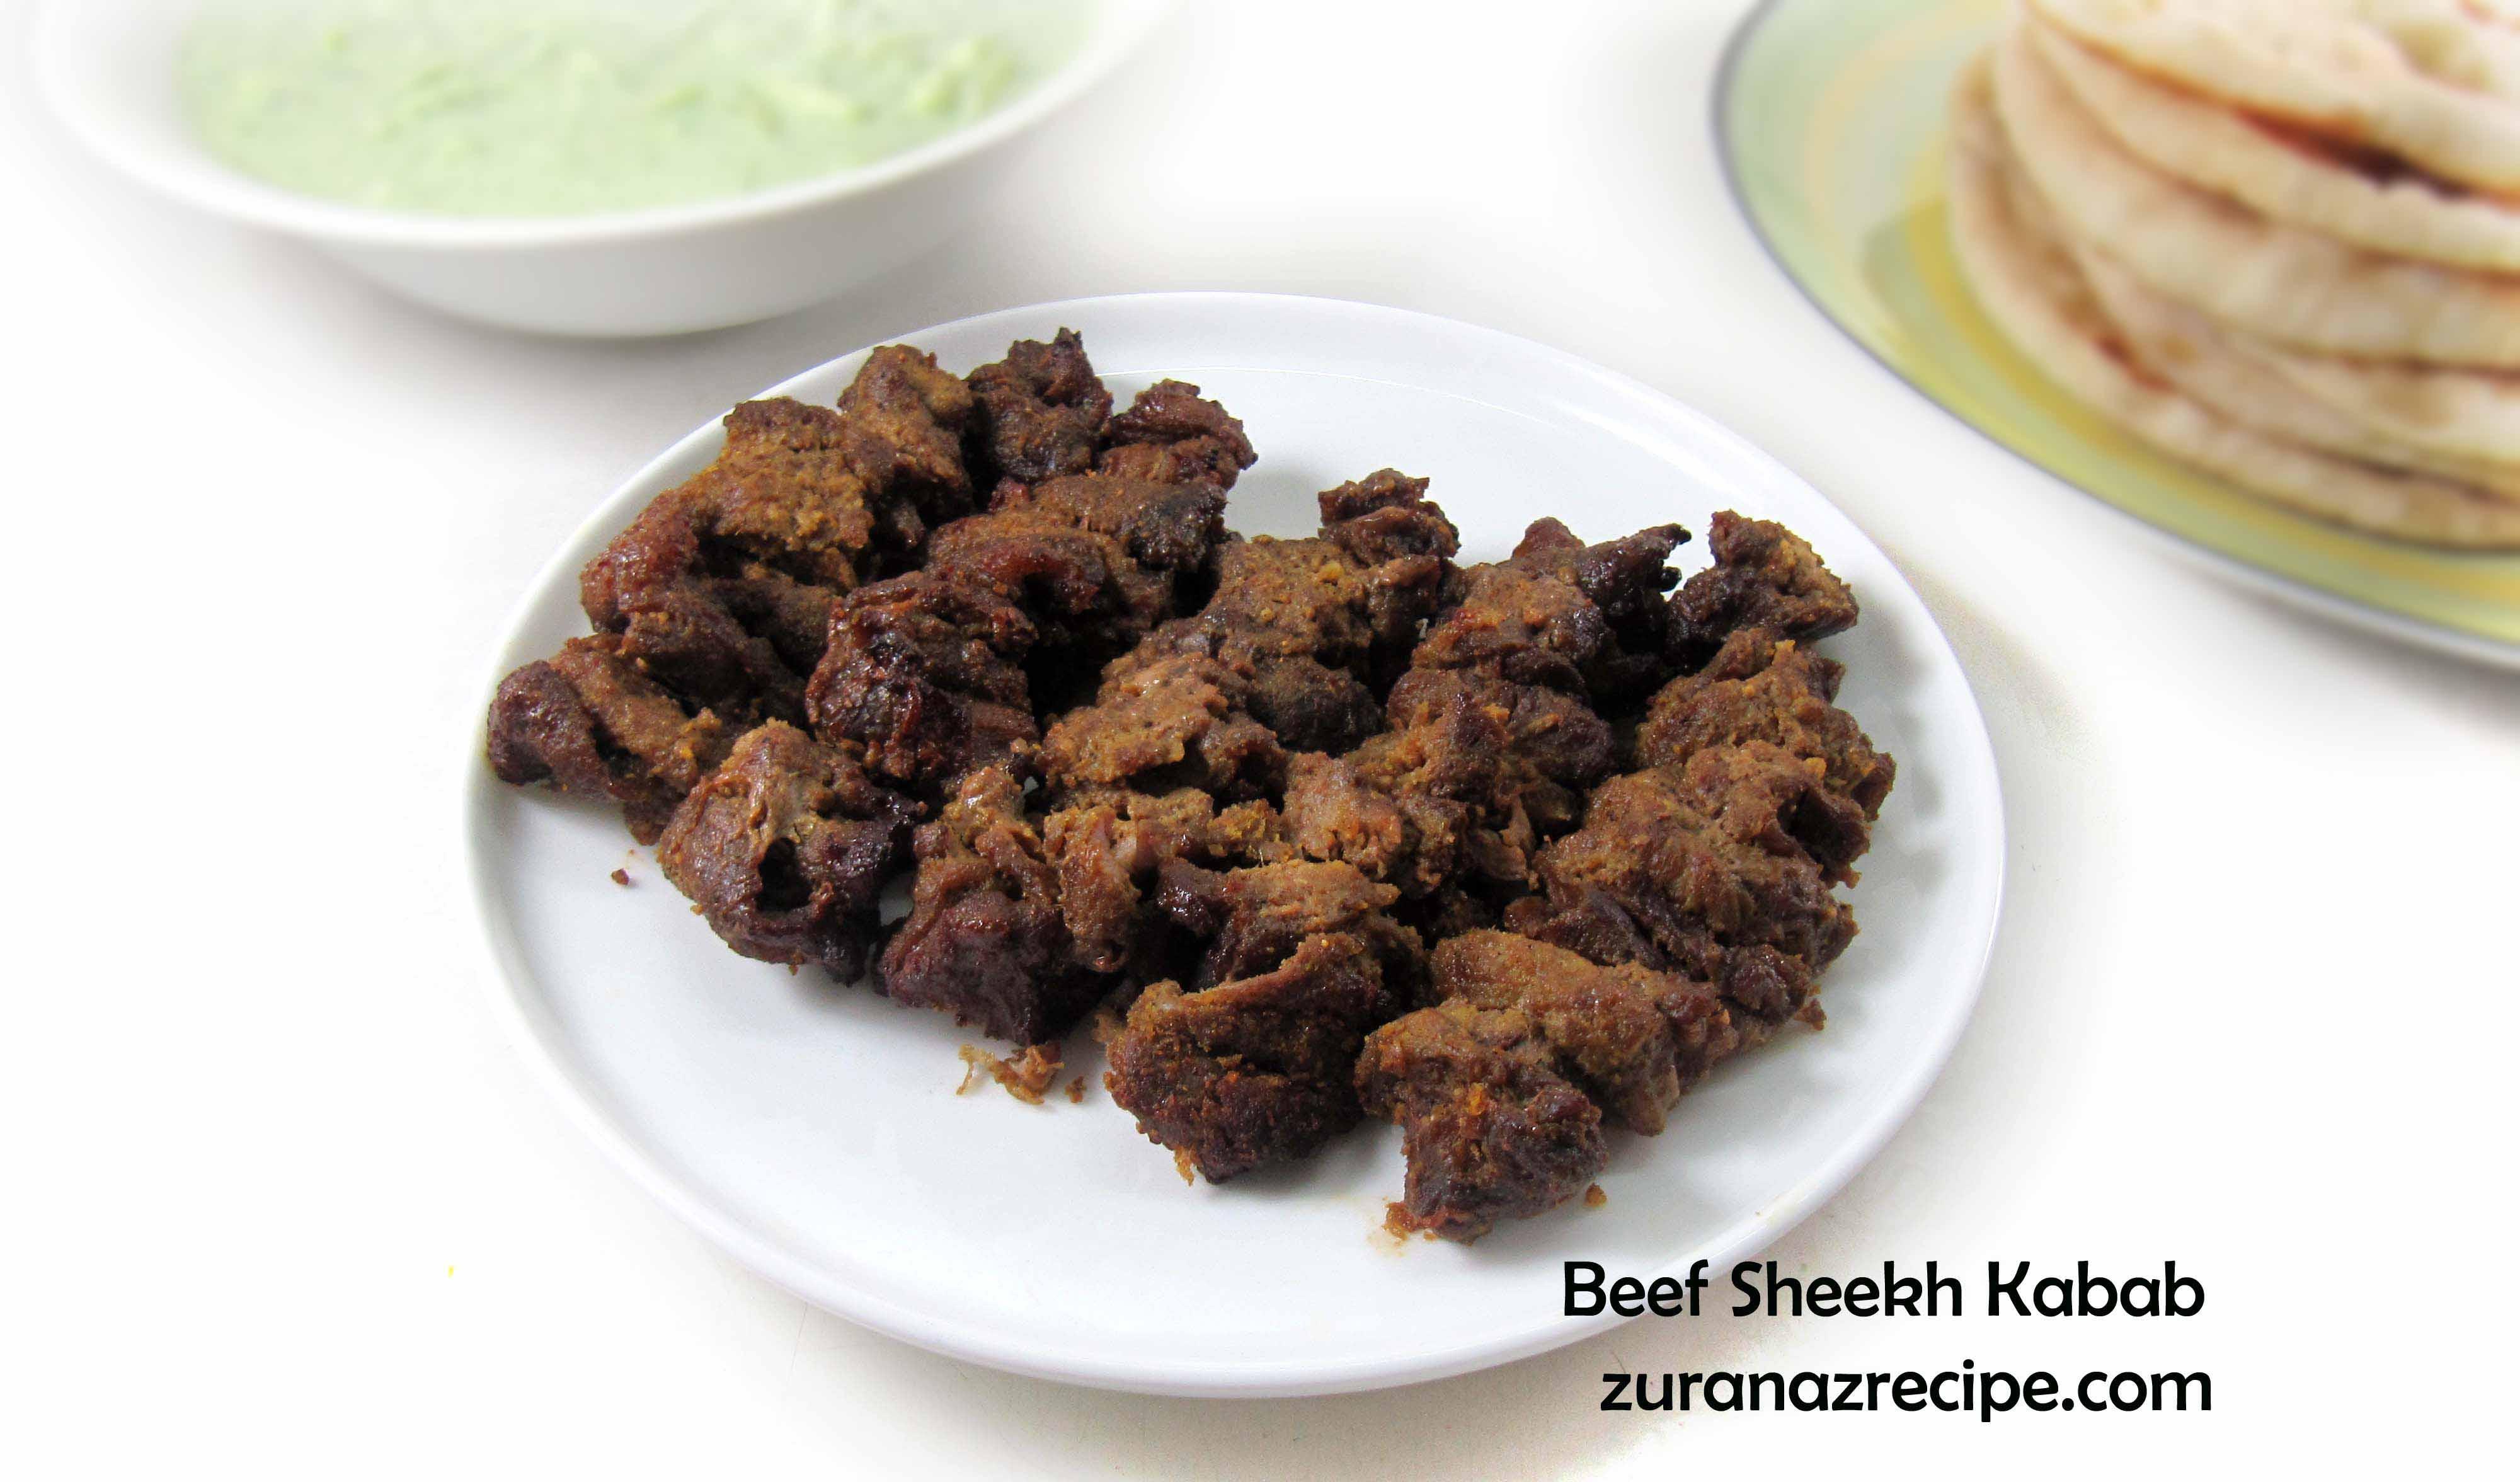 Beef Sheekh Kabab